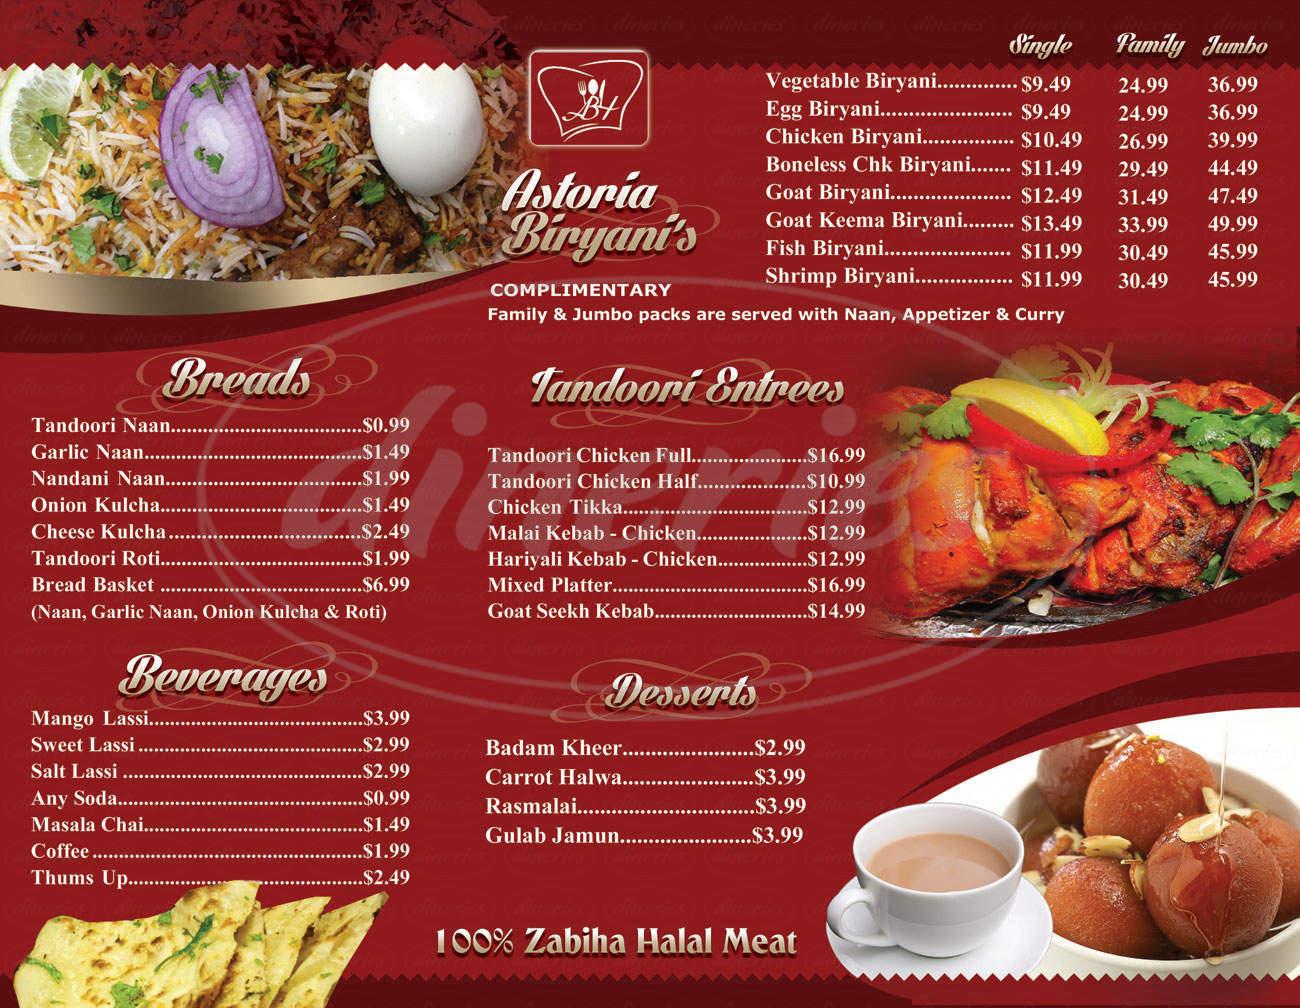 menu for Astoria Biryani House